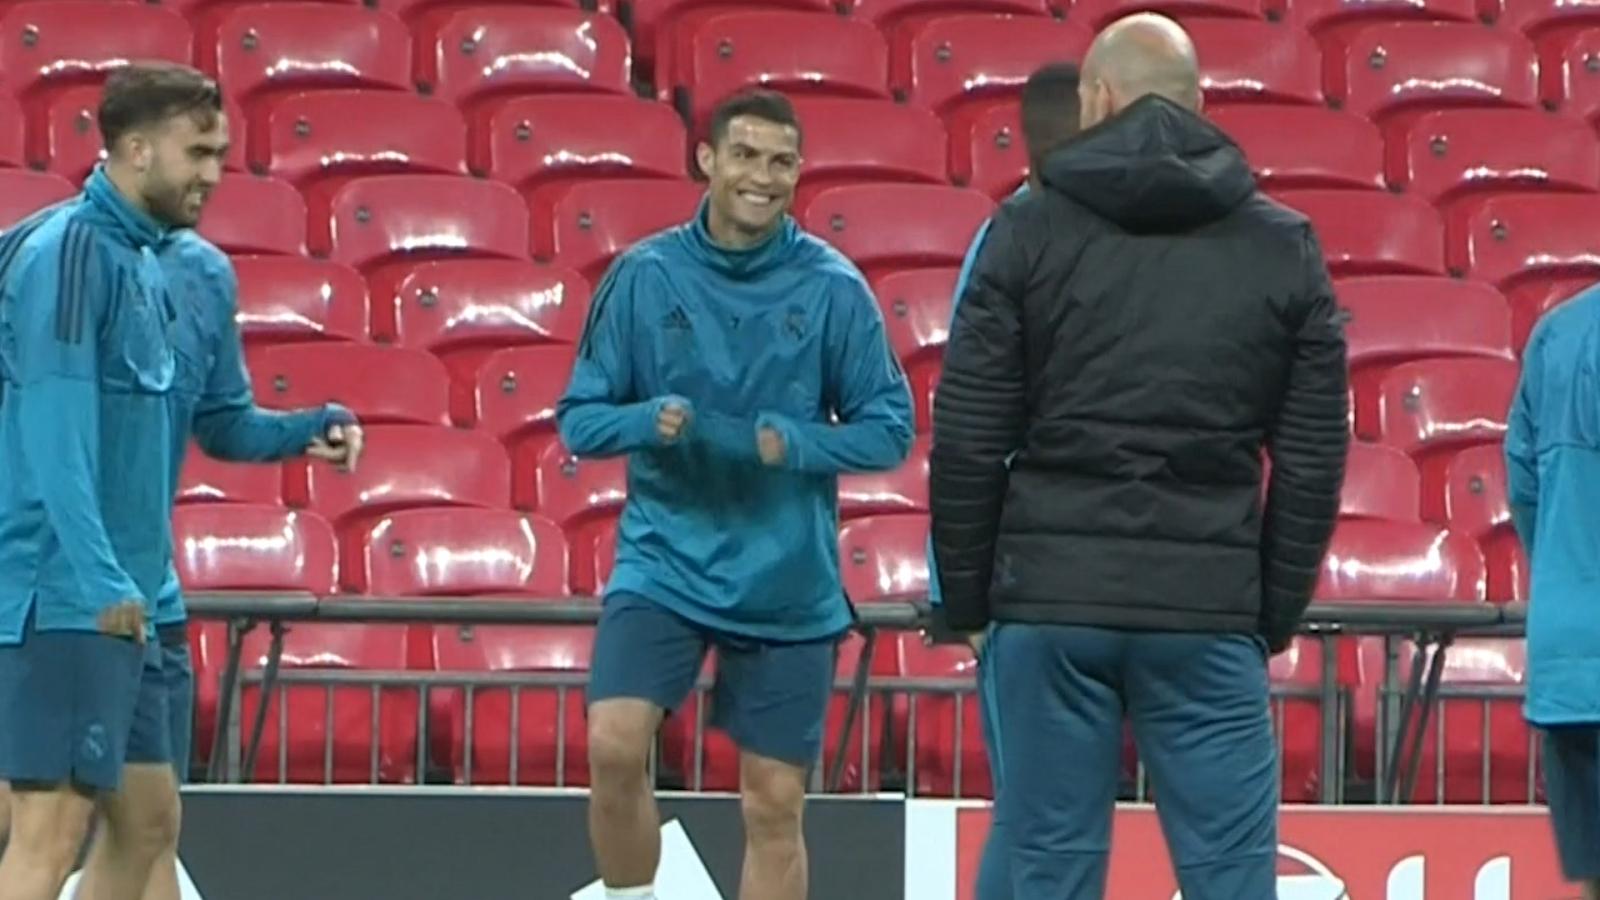 cristiano-ronaldo-nutmegs-real-madrid-teammate-in-training